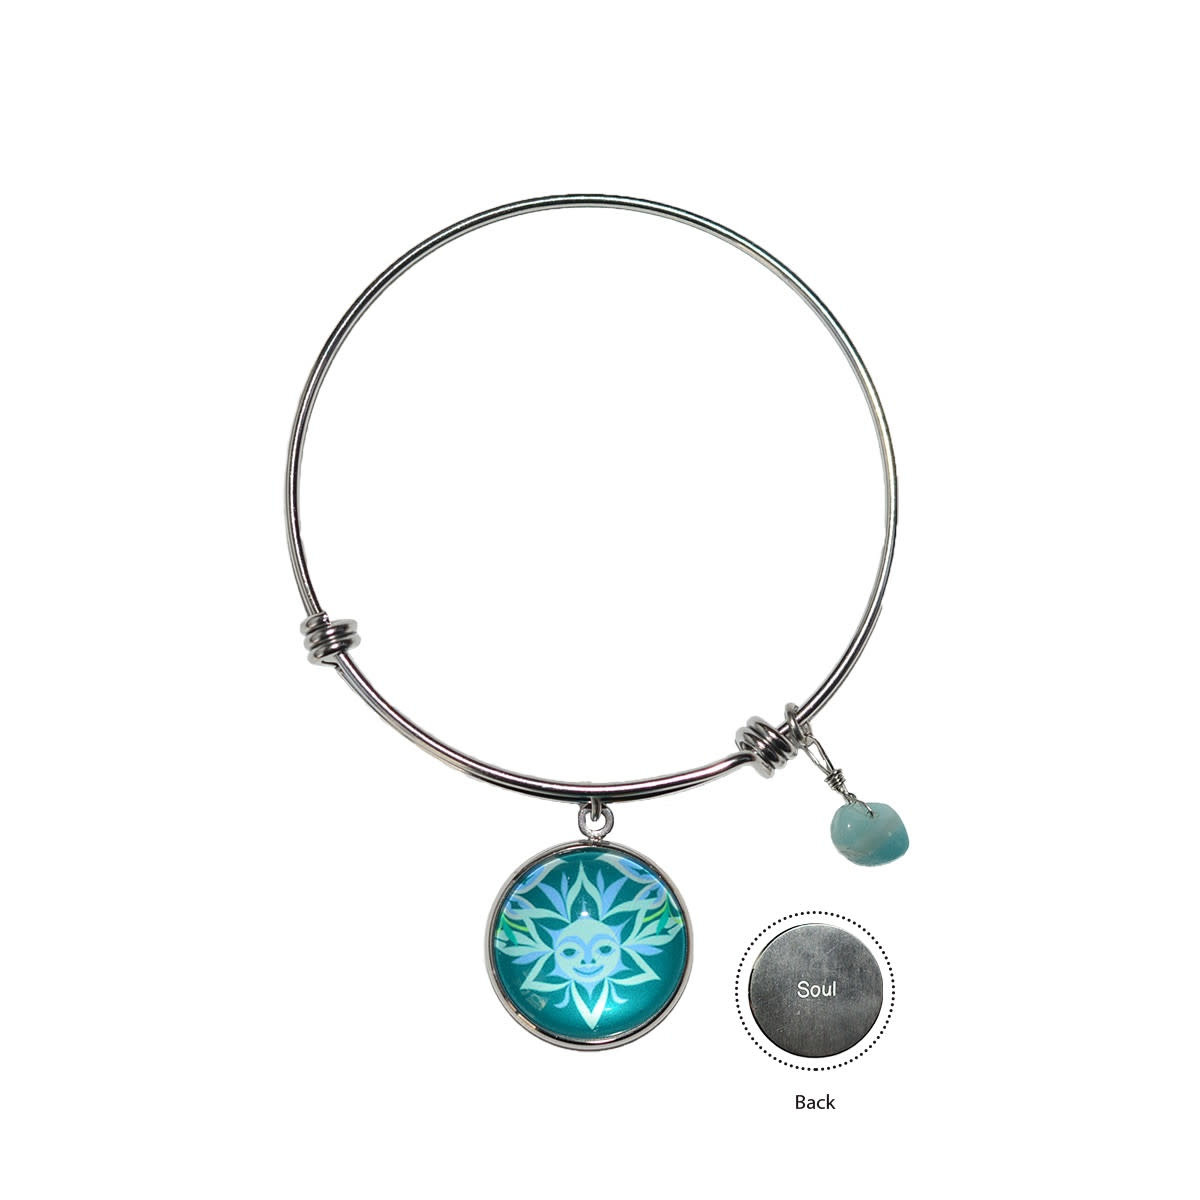 Circle Charm Bangle - Soul Blossom by Simone Diamond-1